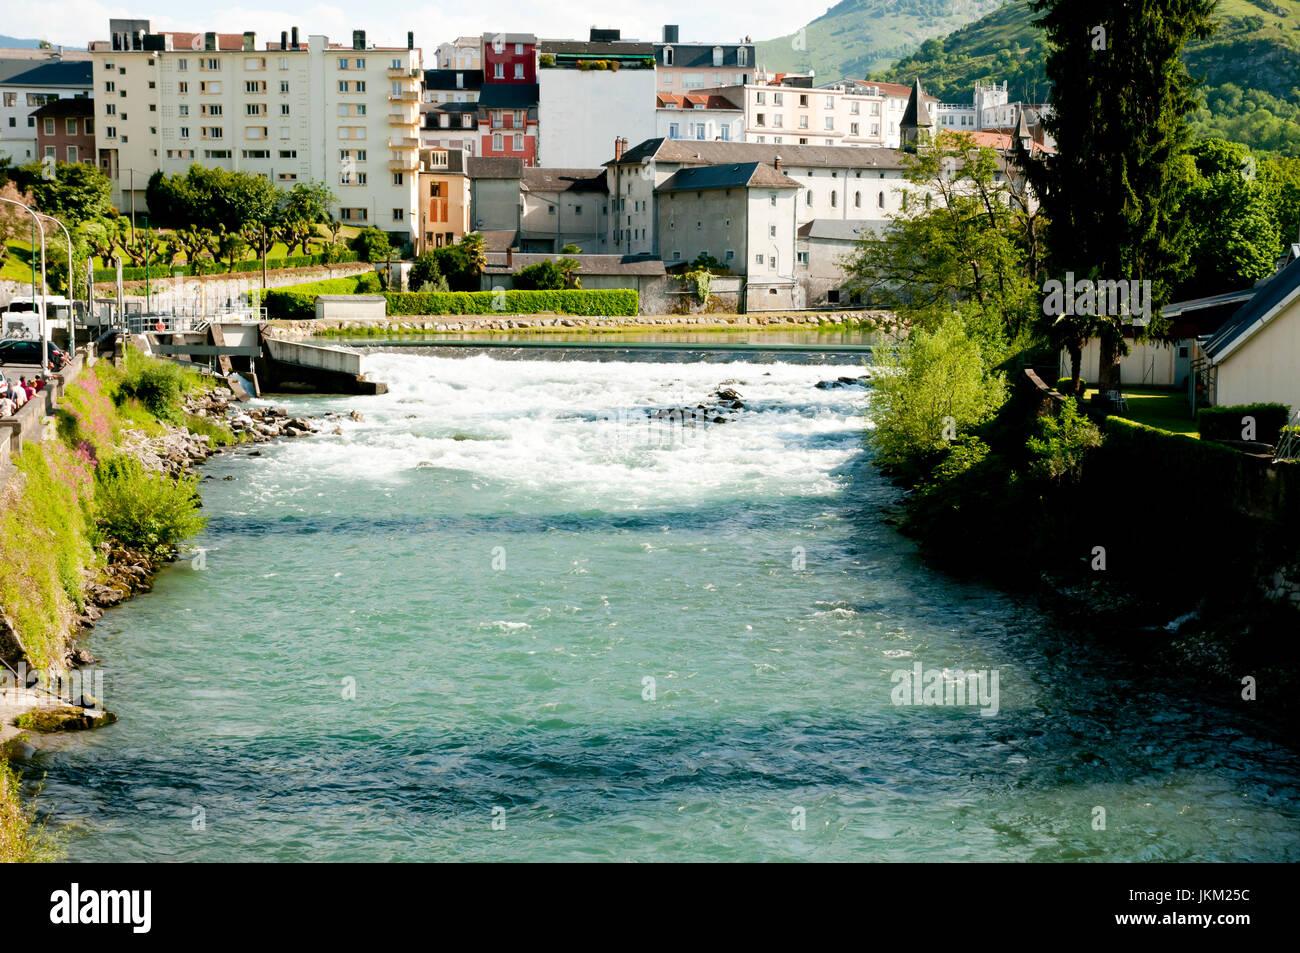 Gave de Pau River - Lourdes - Francia Immagini Stock